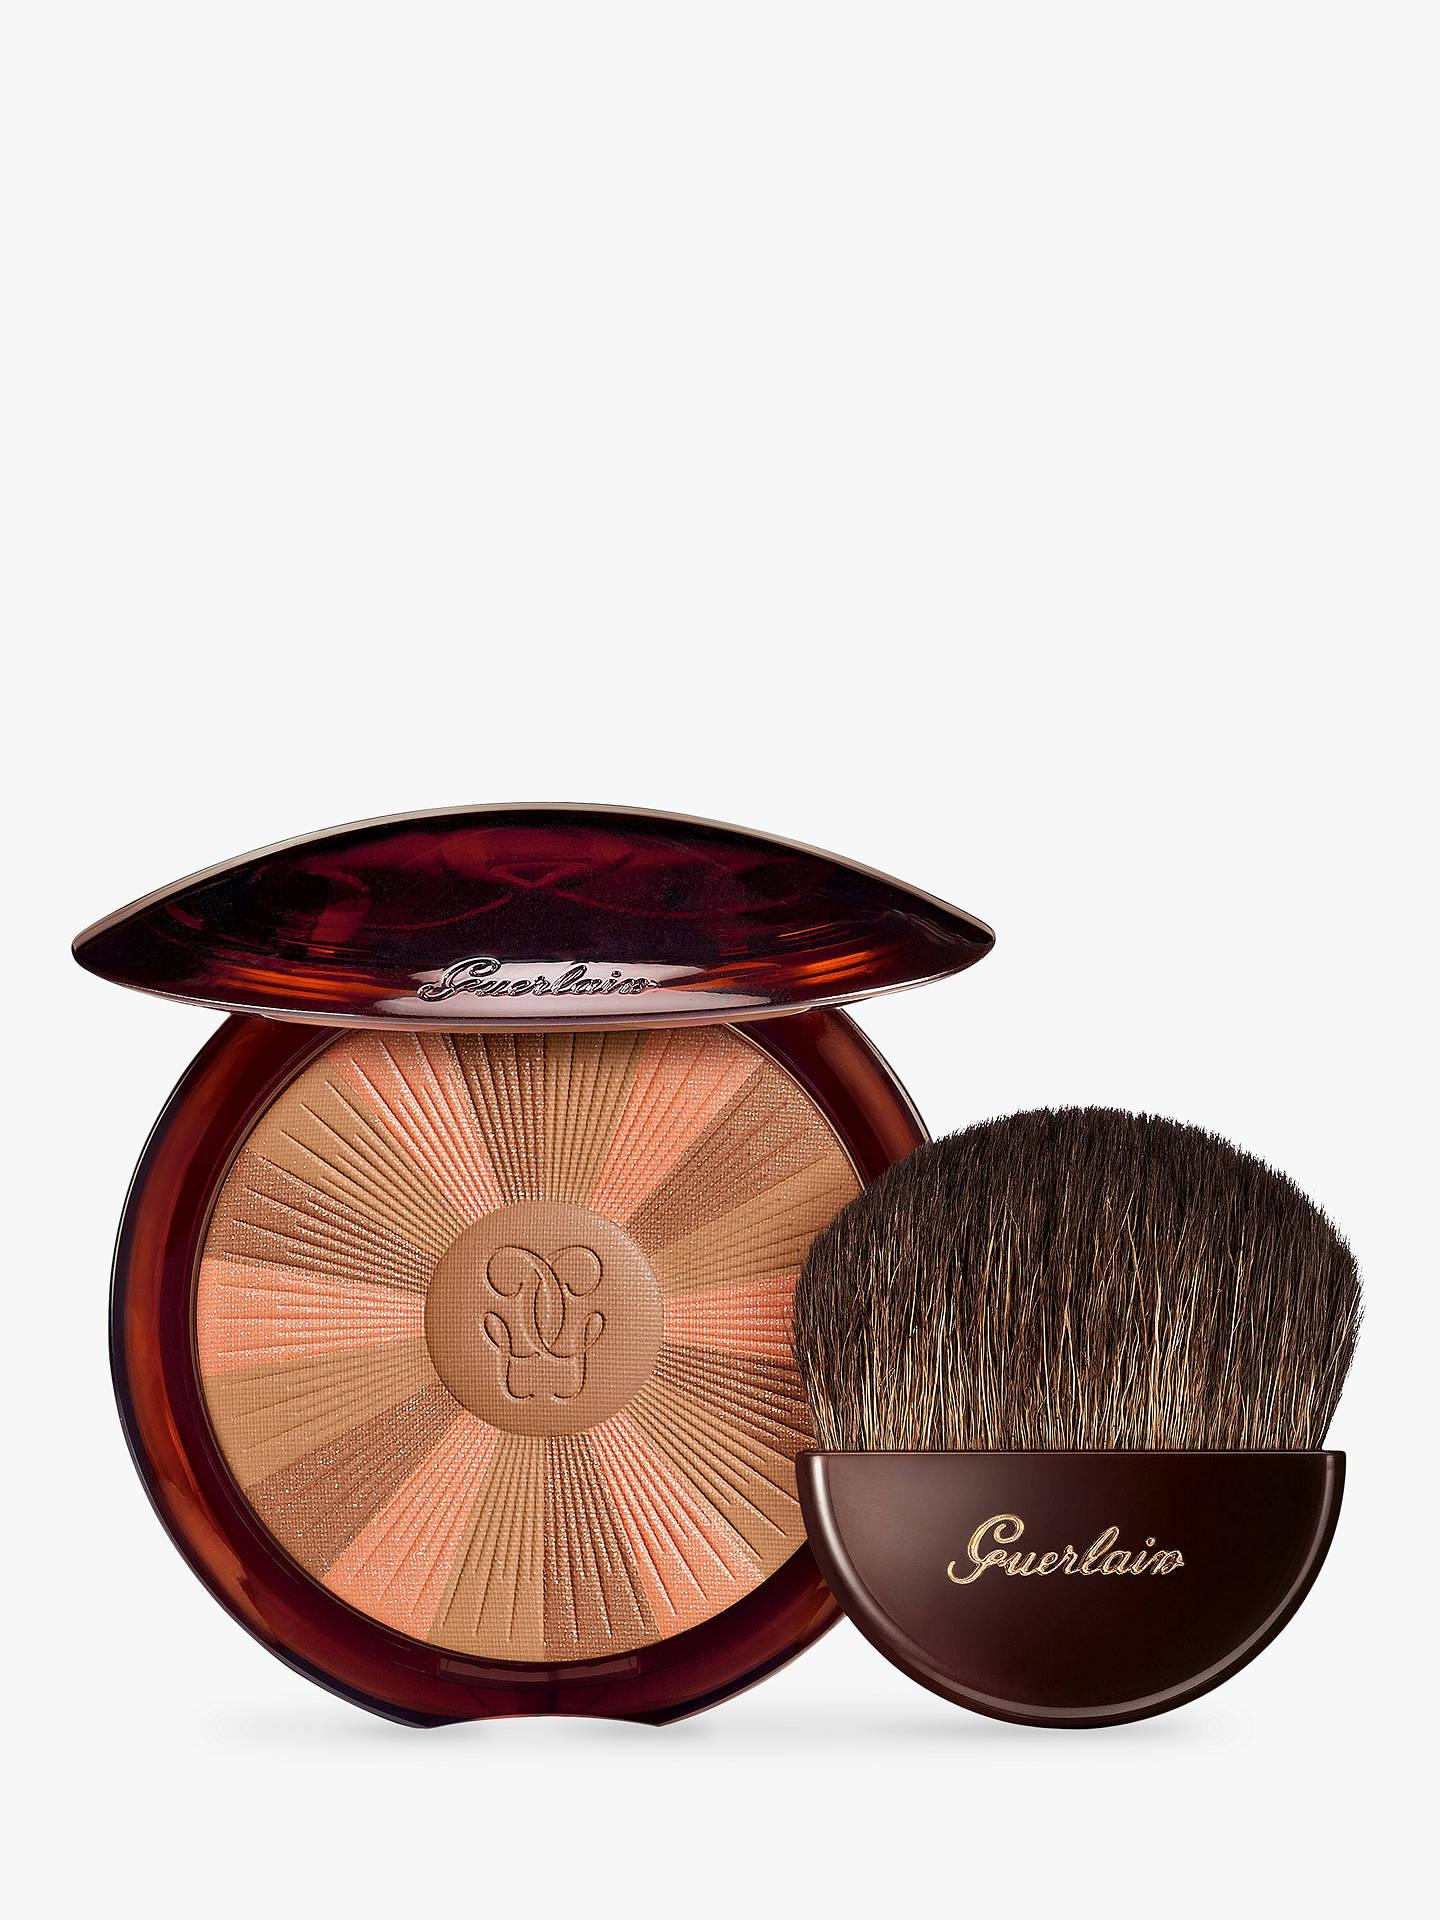 Guerlain Terracotta Light Powder Bronzer with Brush, 03 at ...